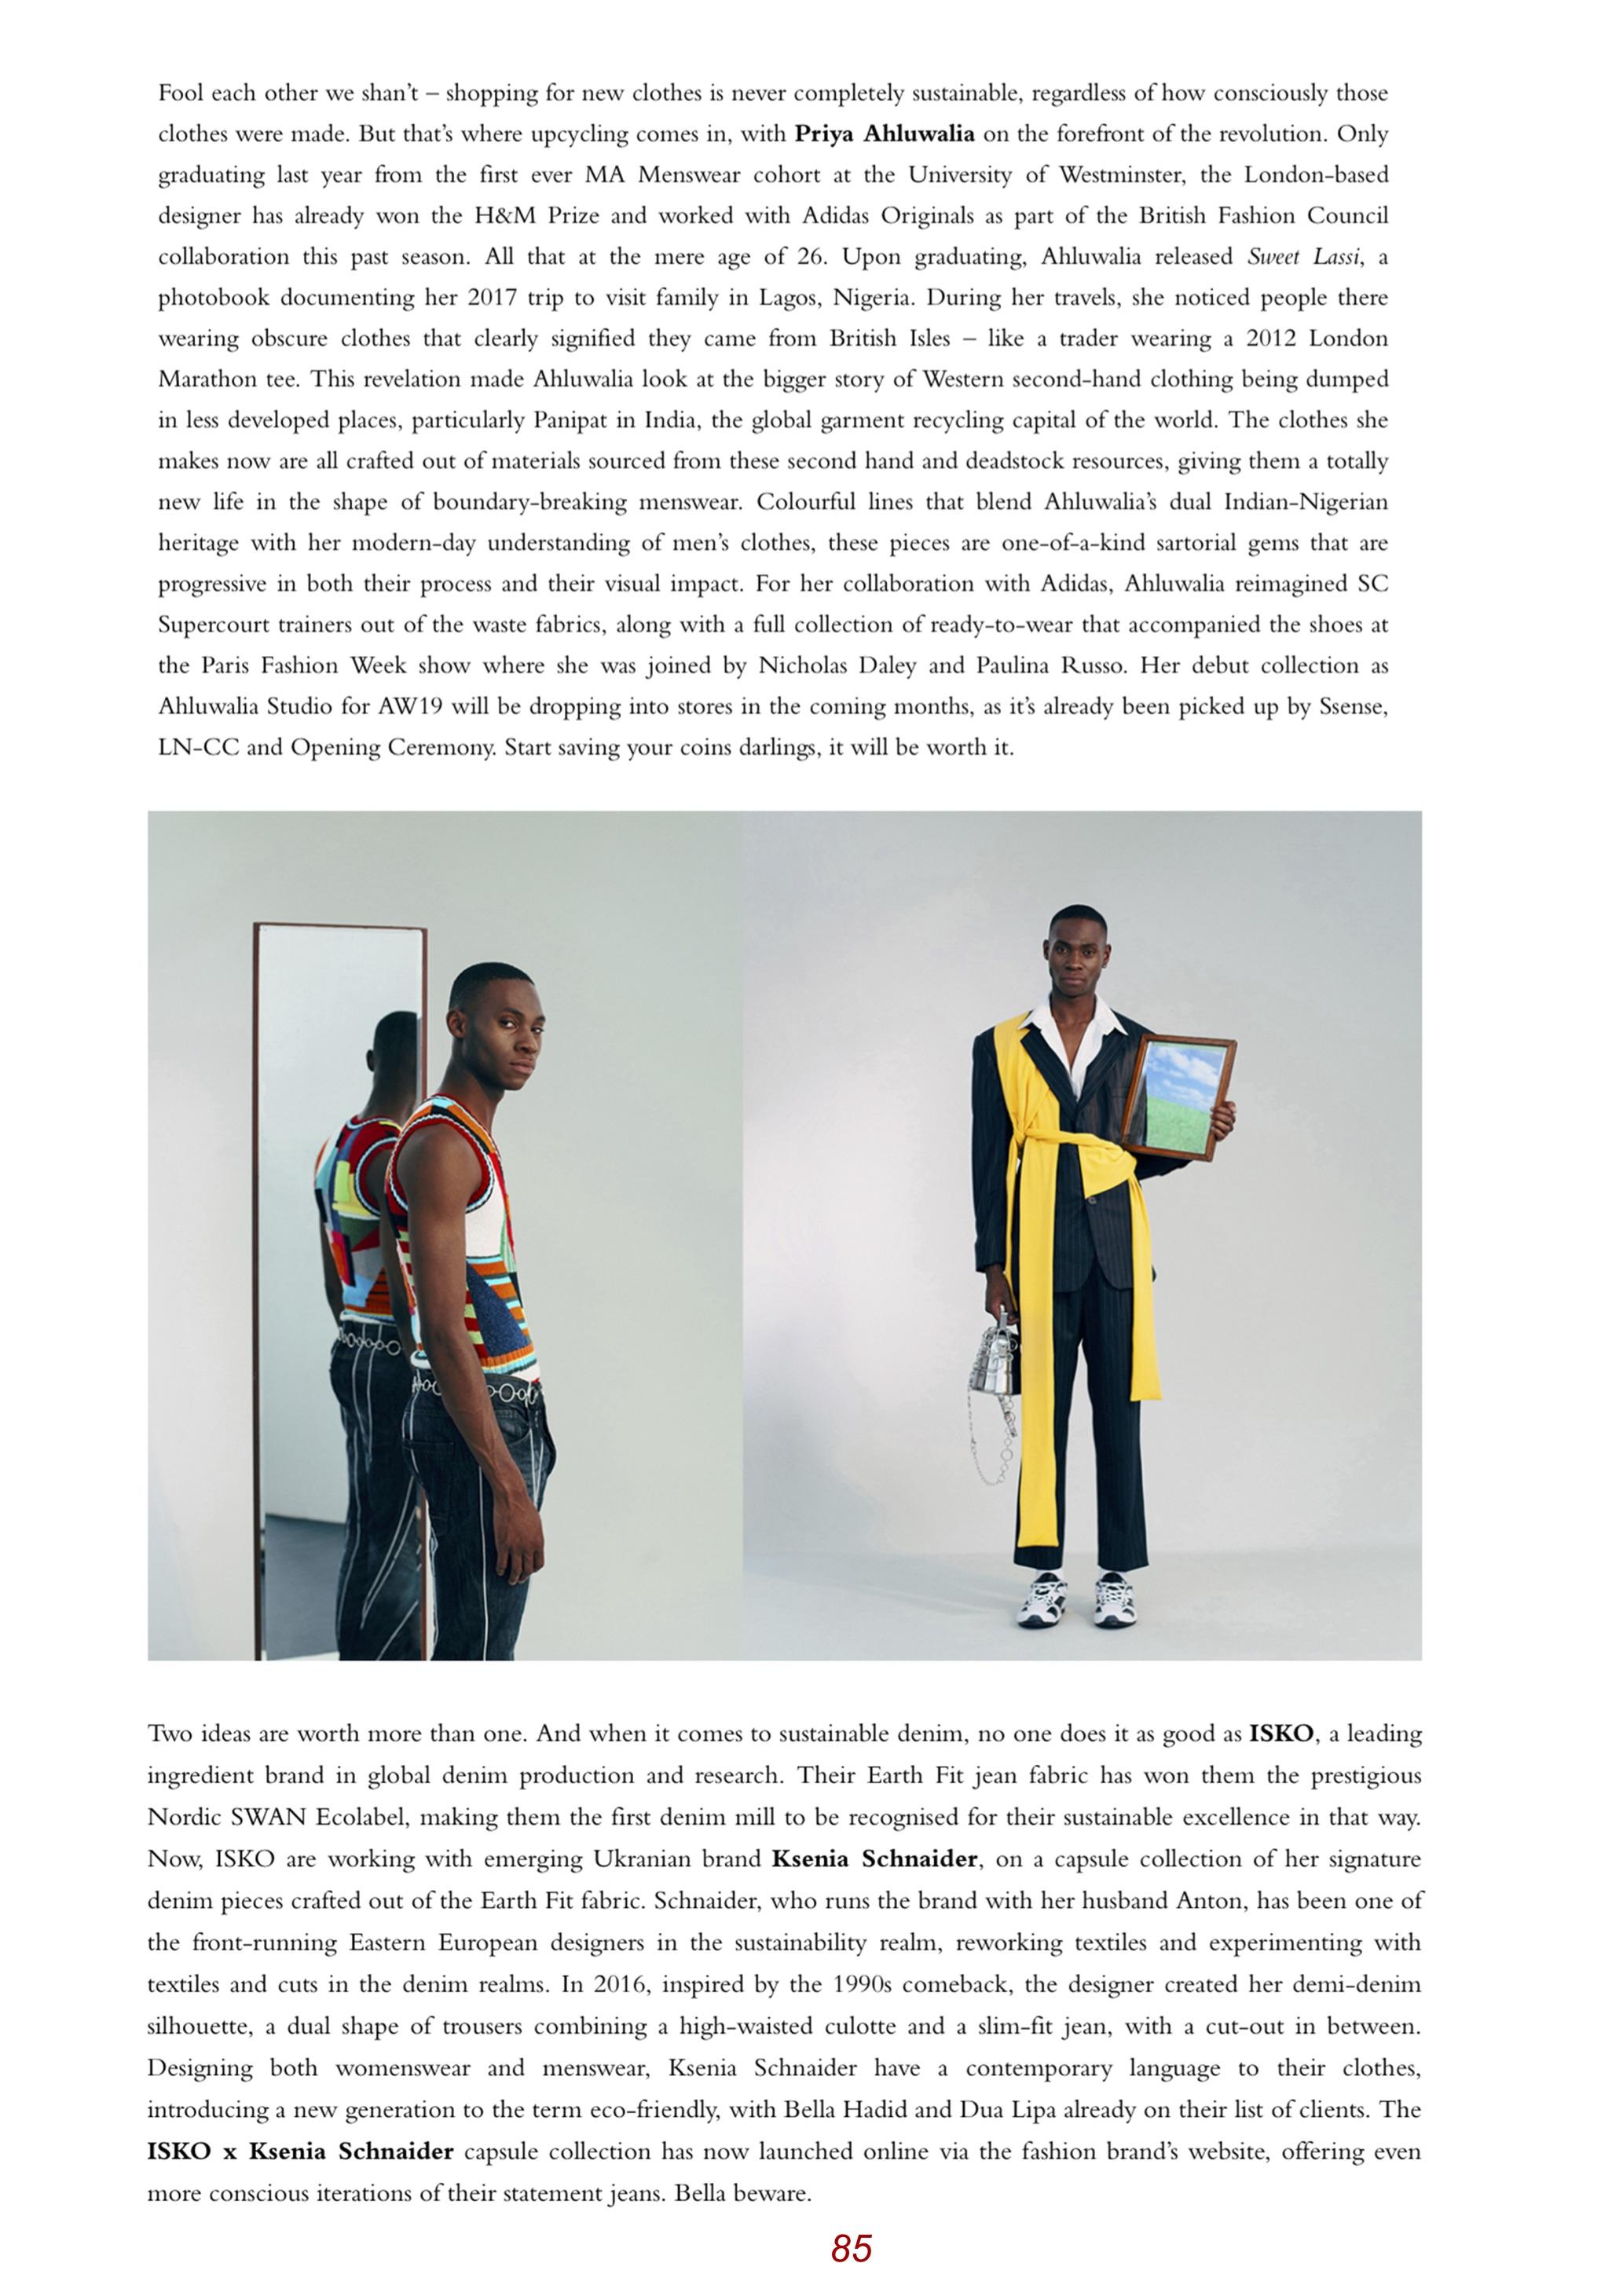 page 85 photo.jpg